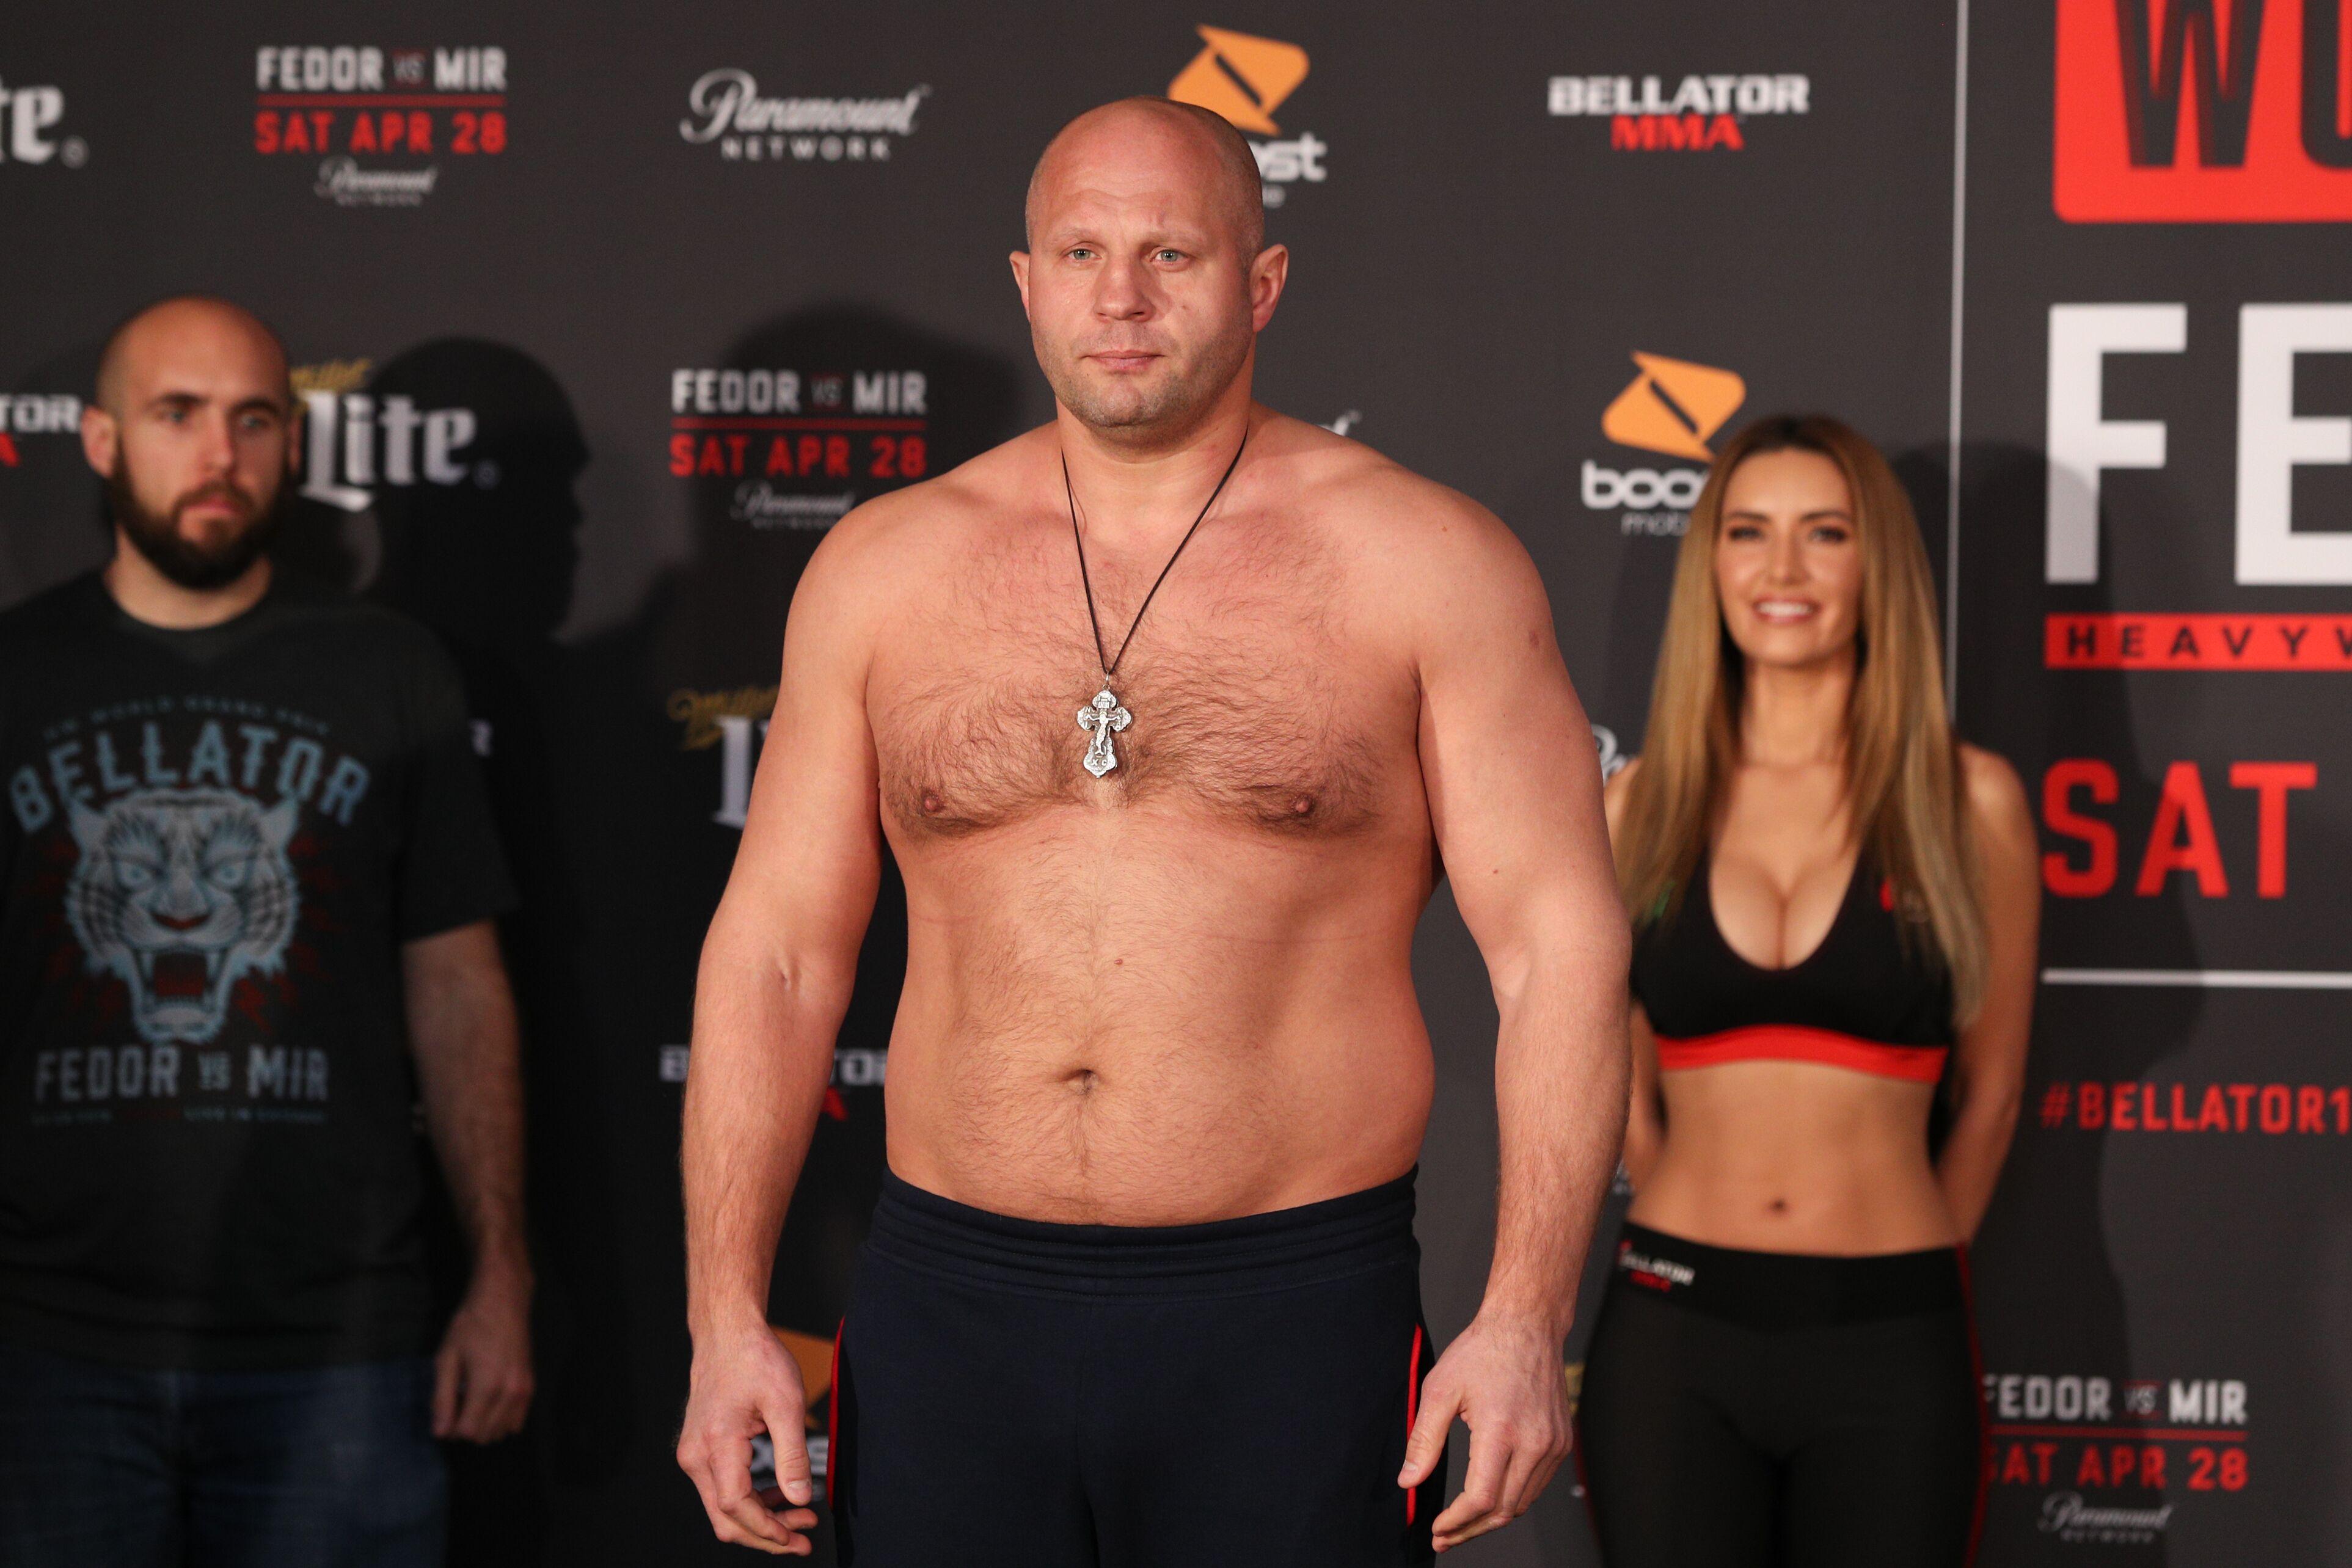 Bellator 208: Fedor Emelianenko drops Chael Sonnen for first round TKO